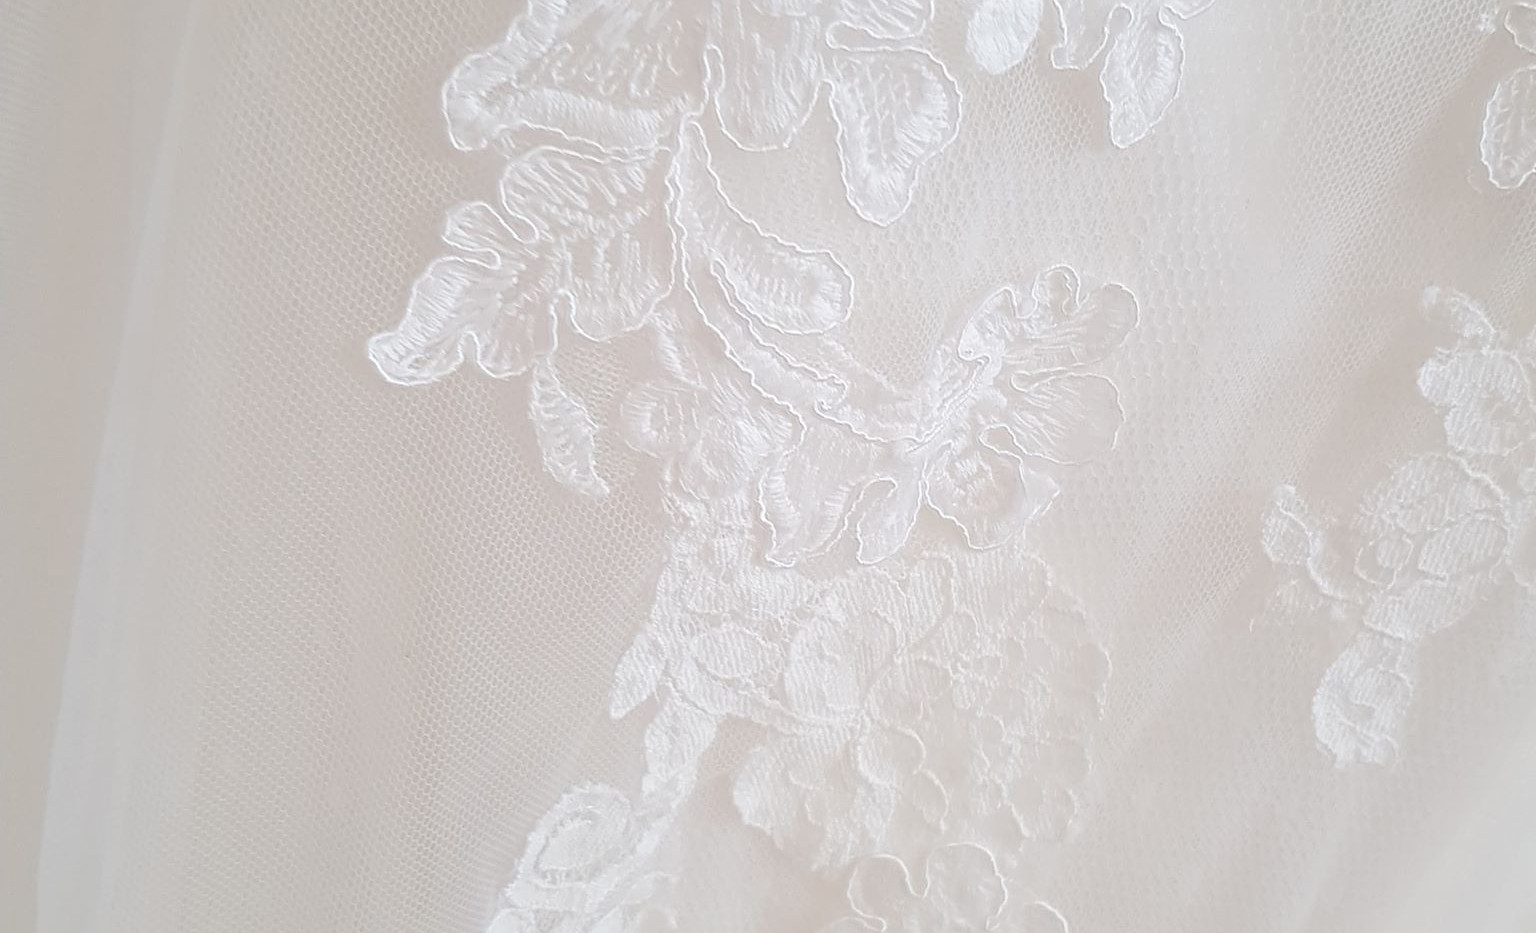 071-White-one-09.jpg